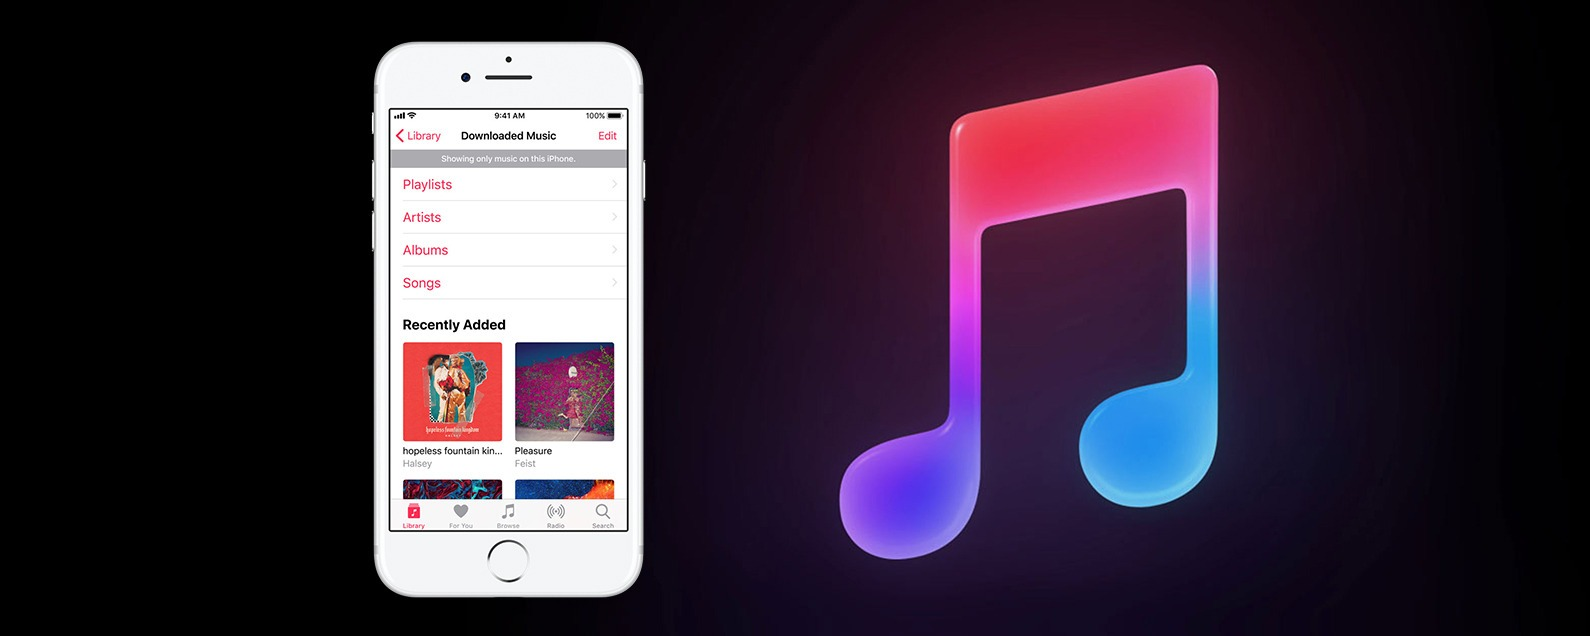 apple music free trial | iPhoneLife com